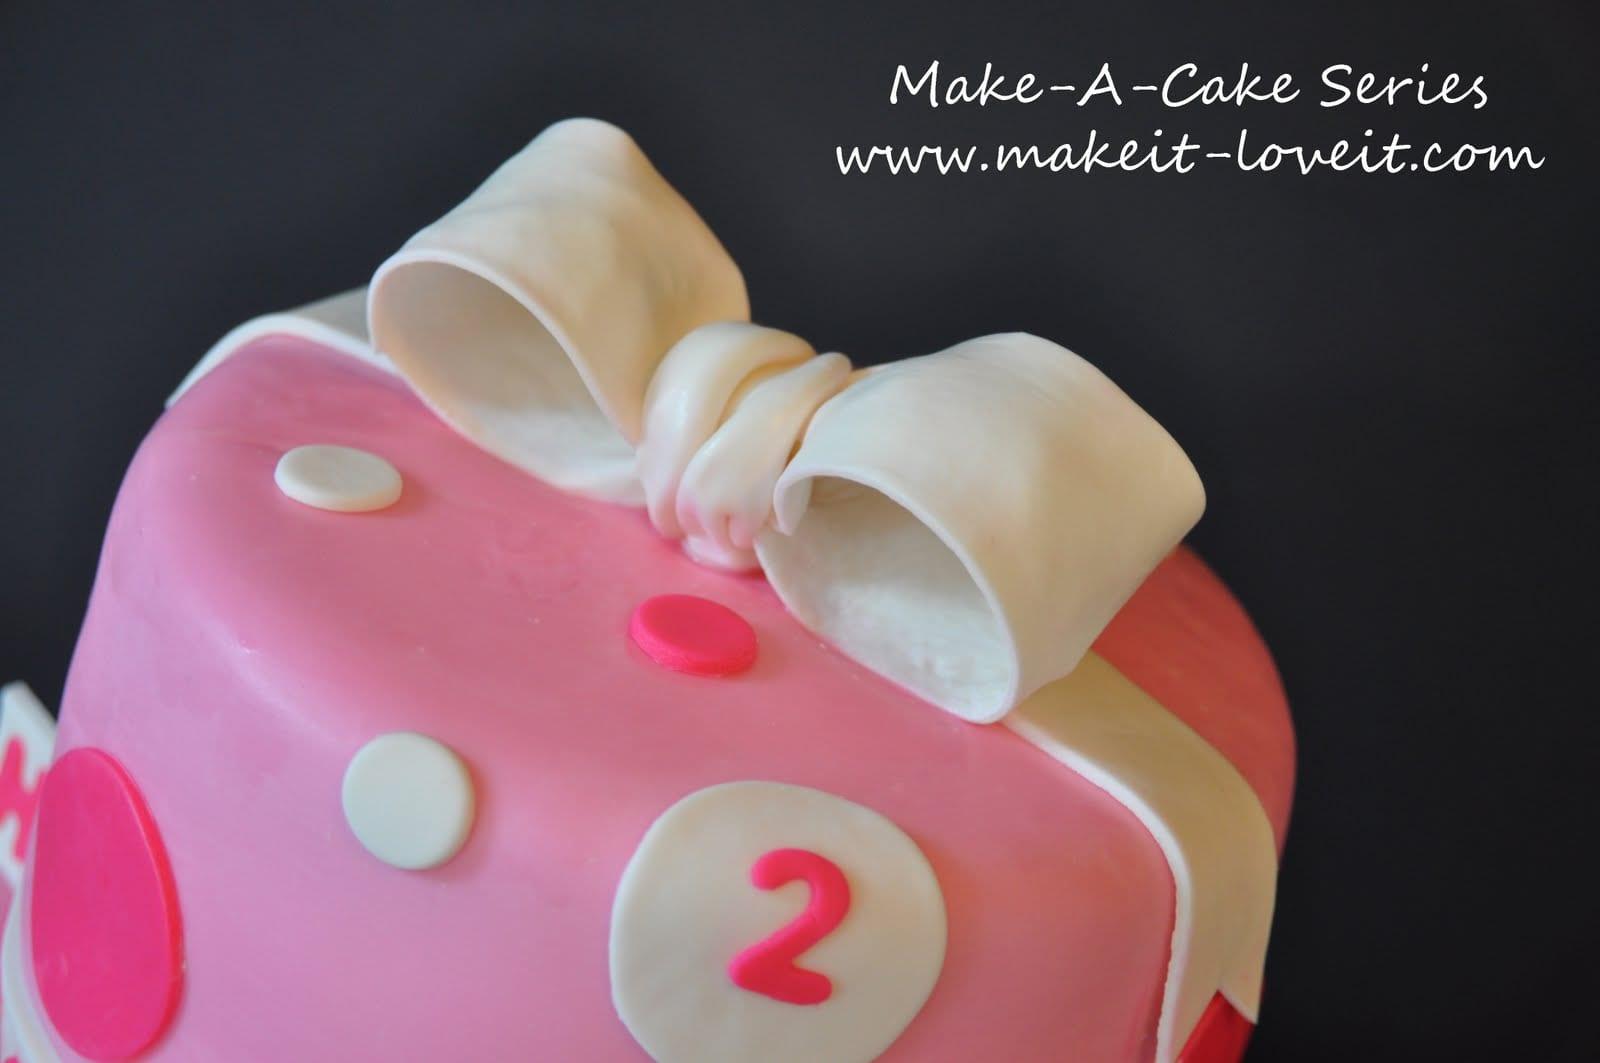 Make-a-Cake Series: Gumpaste Bow, Part II